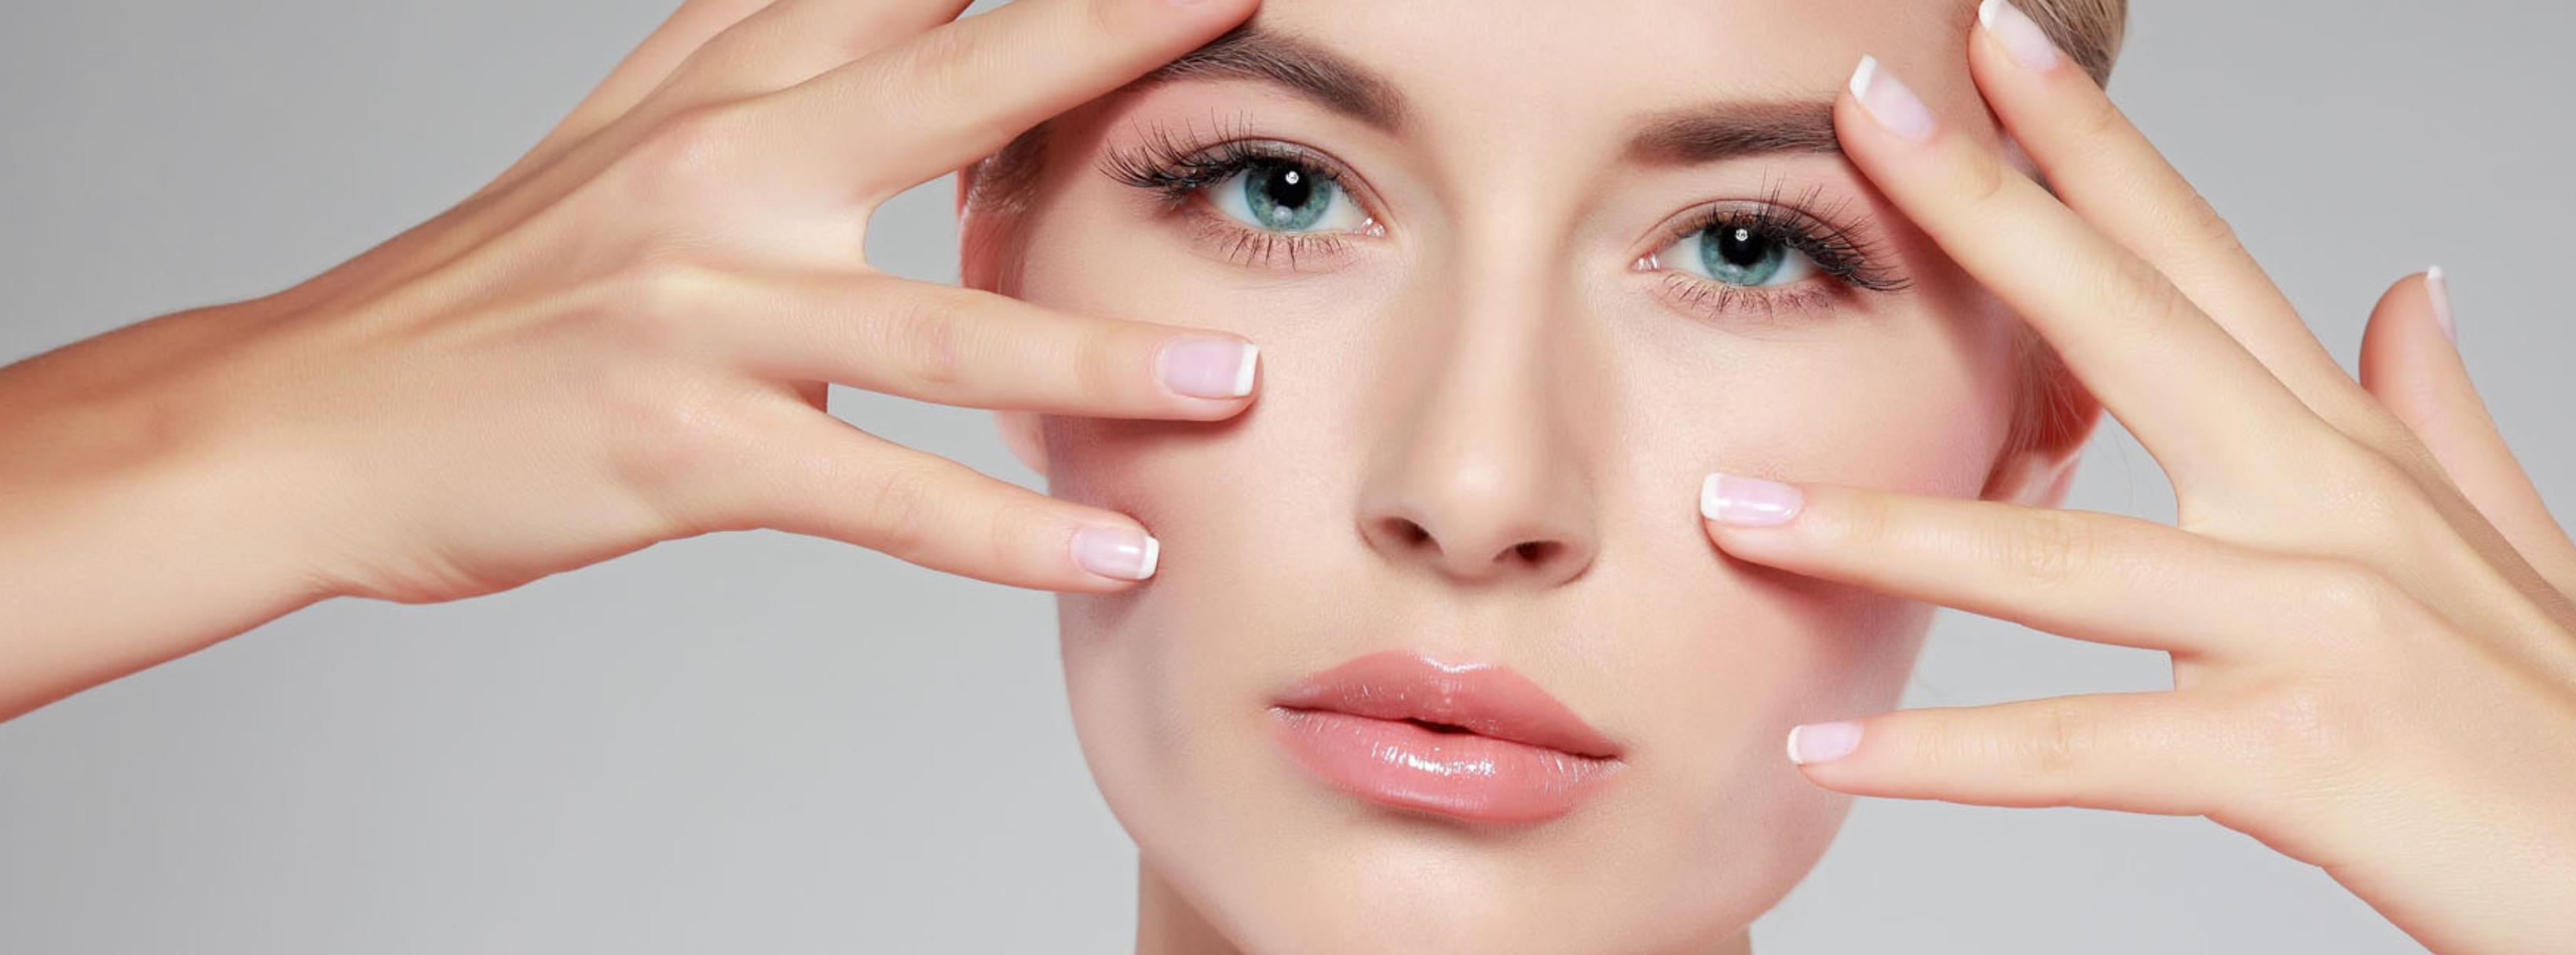 Khan Eyelid & Facial Aesthetics image 4